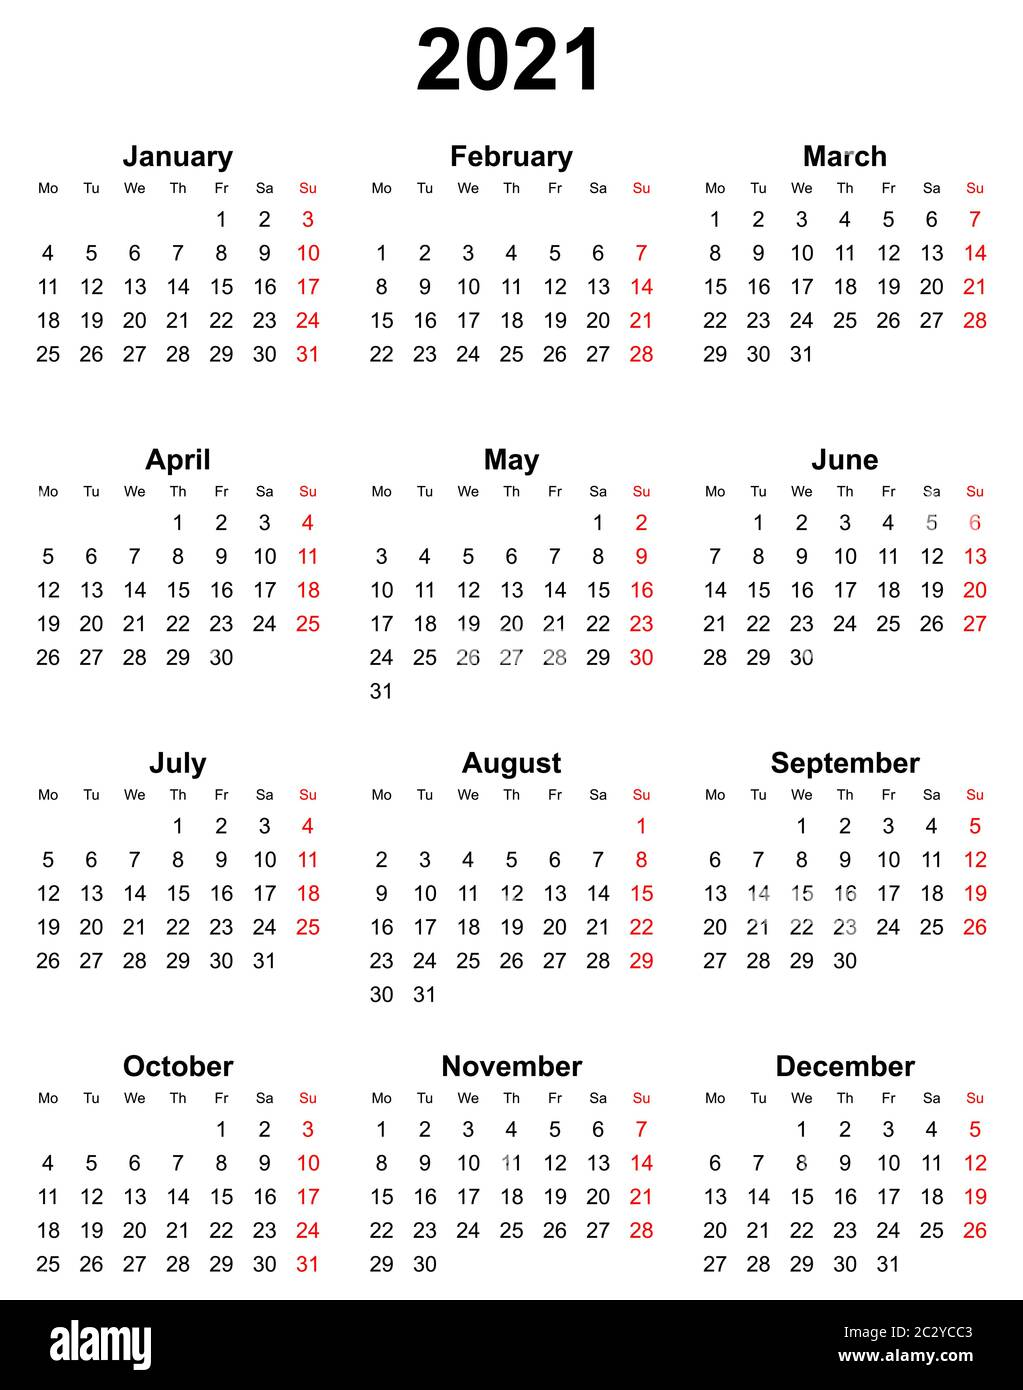 2021 Calendar Sundays Pictures